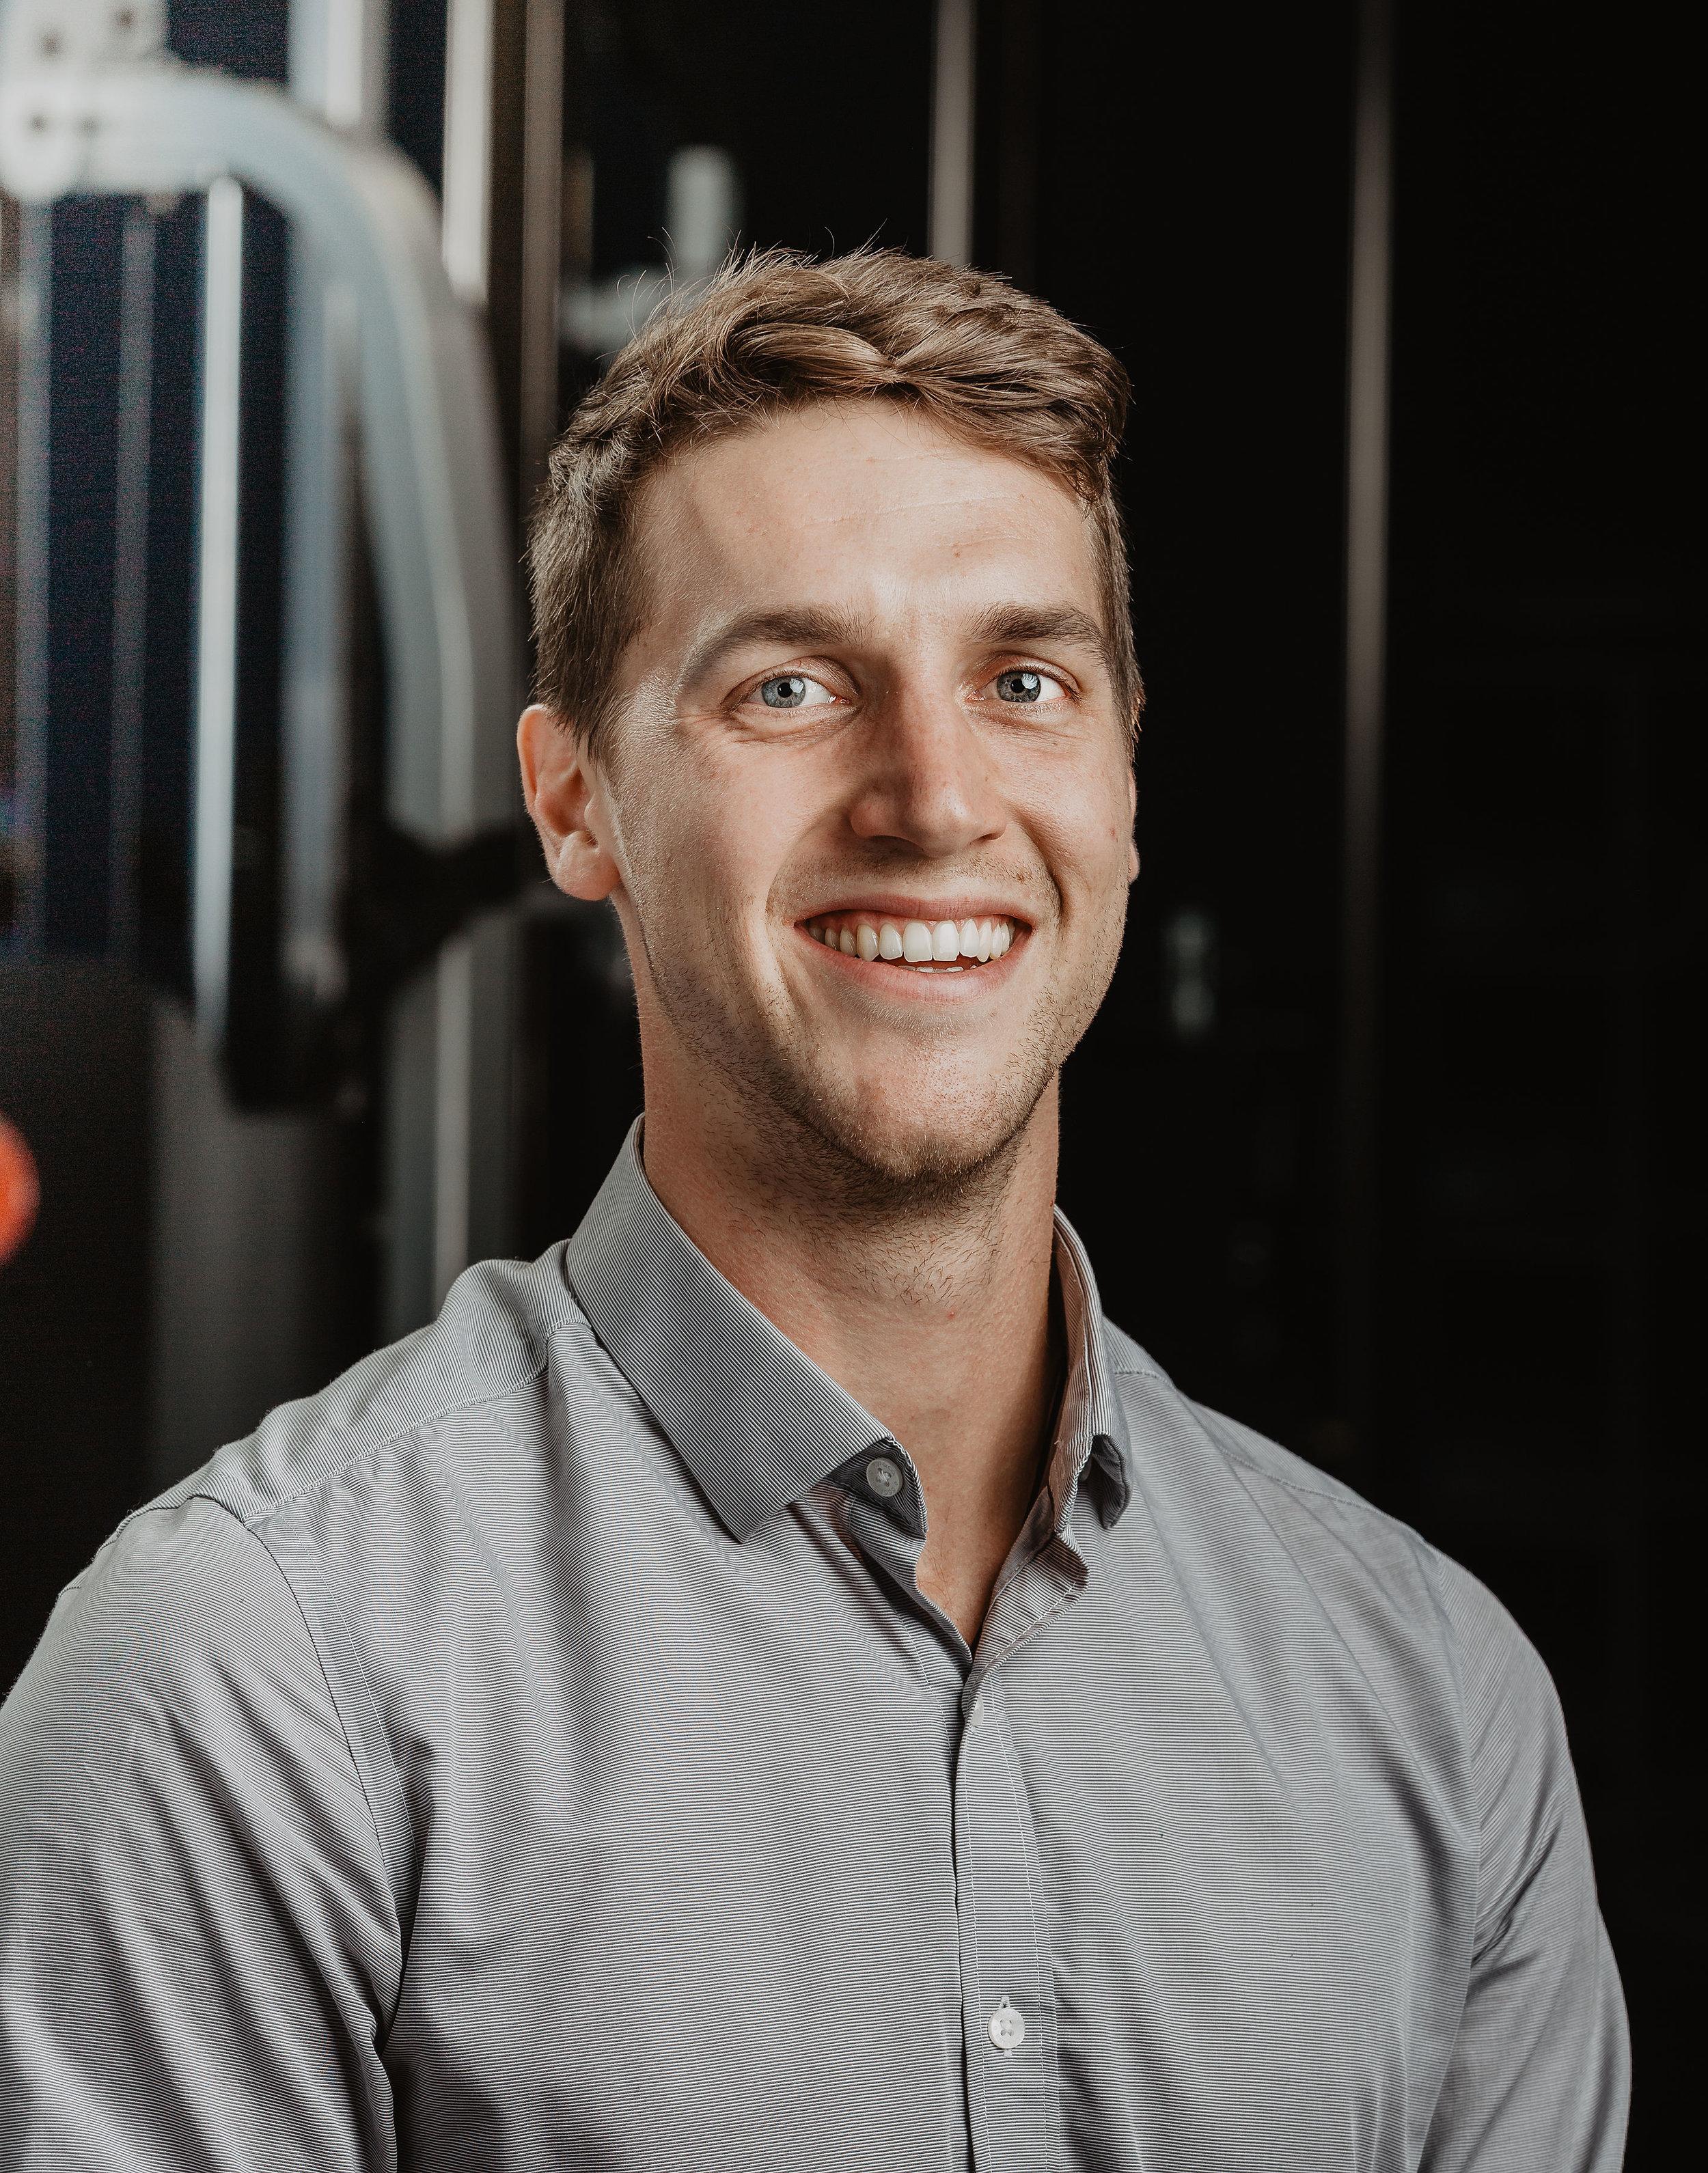 Daniel DeBruyne - Physiotherapist